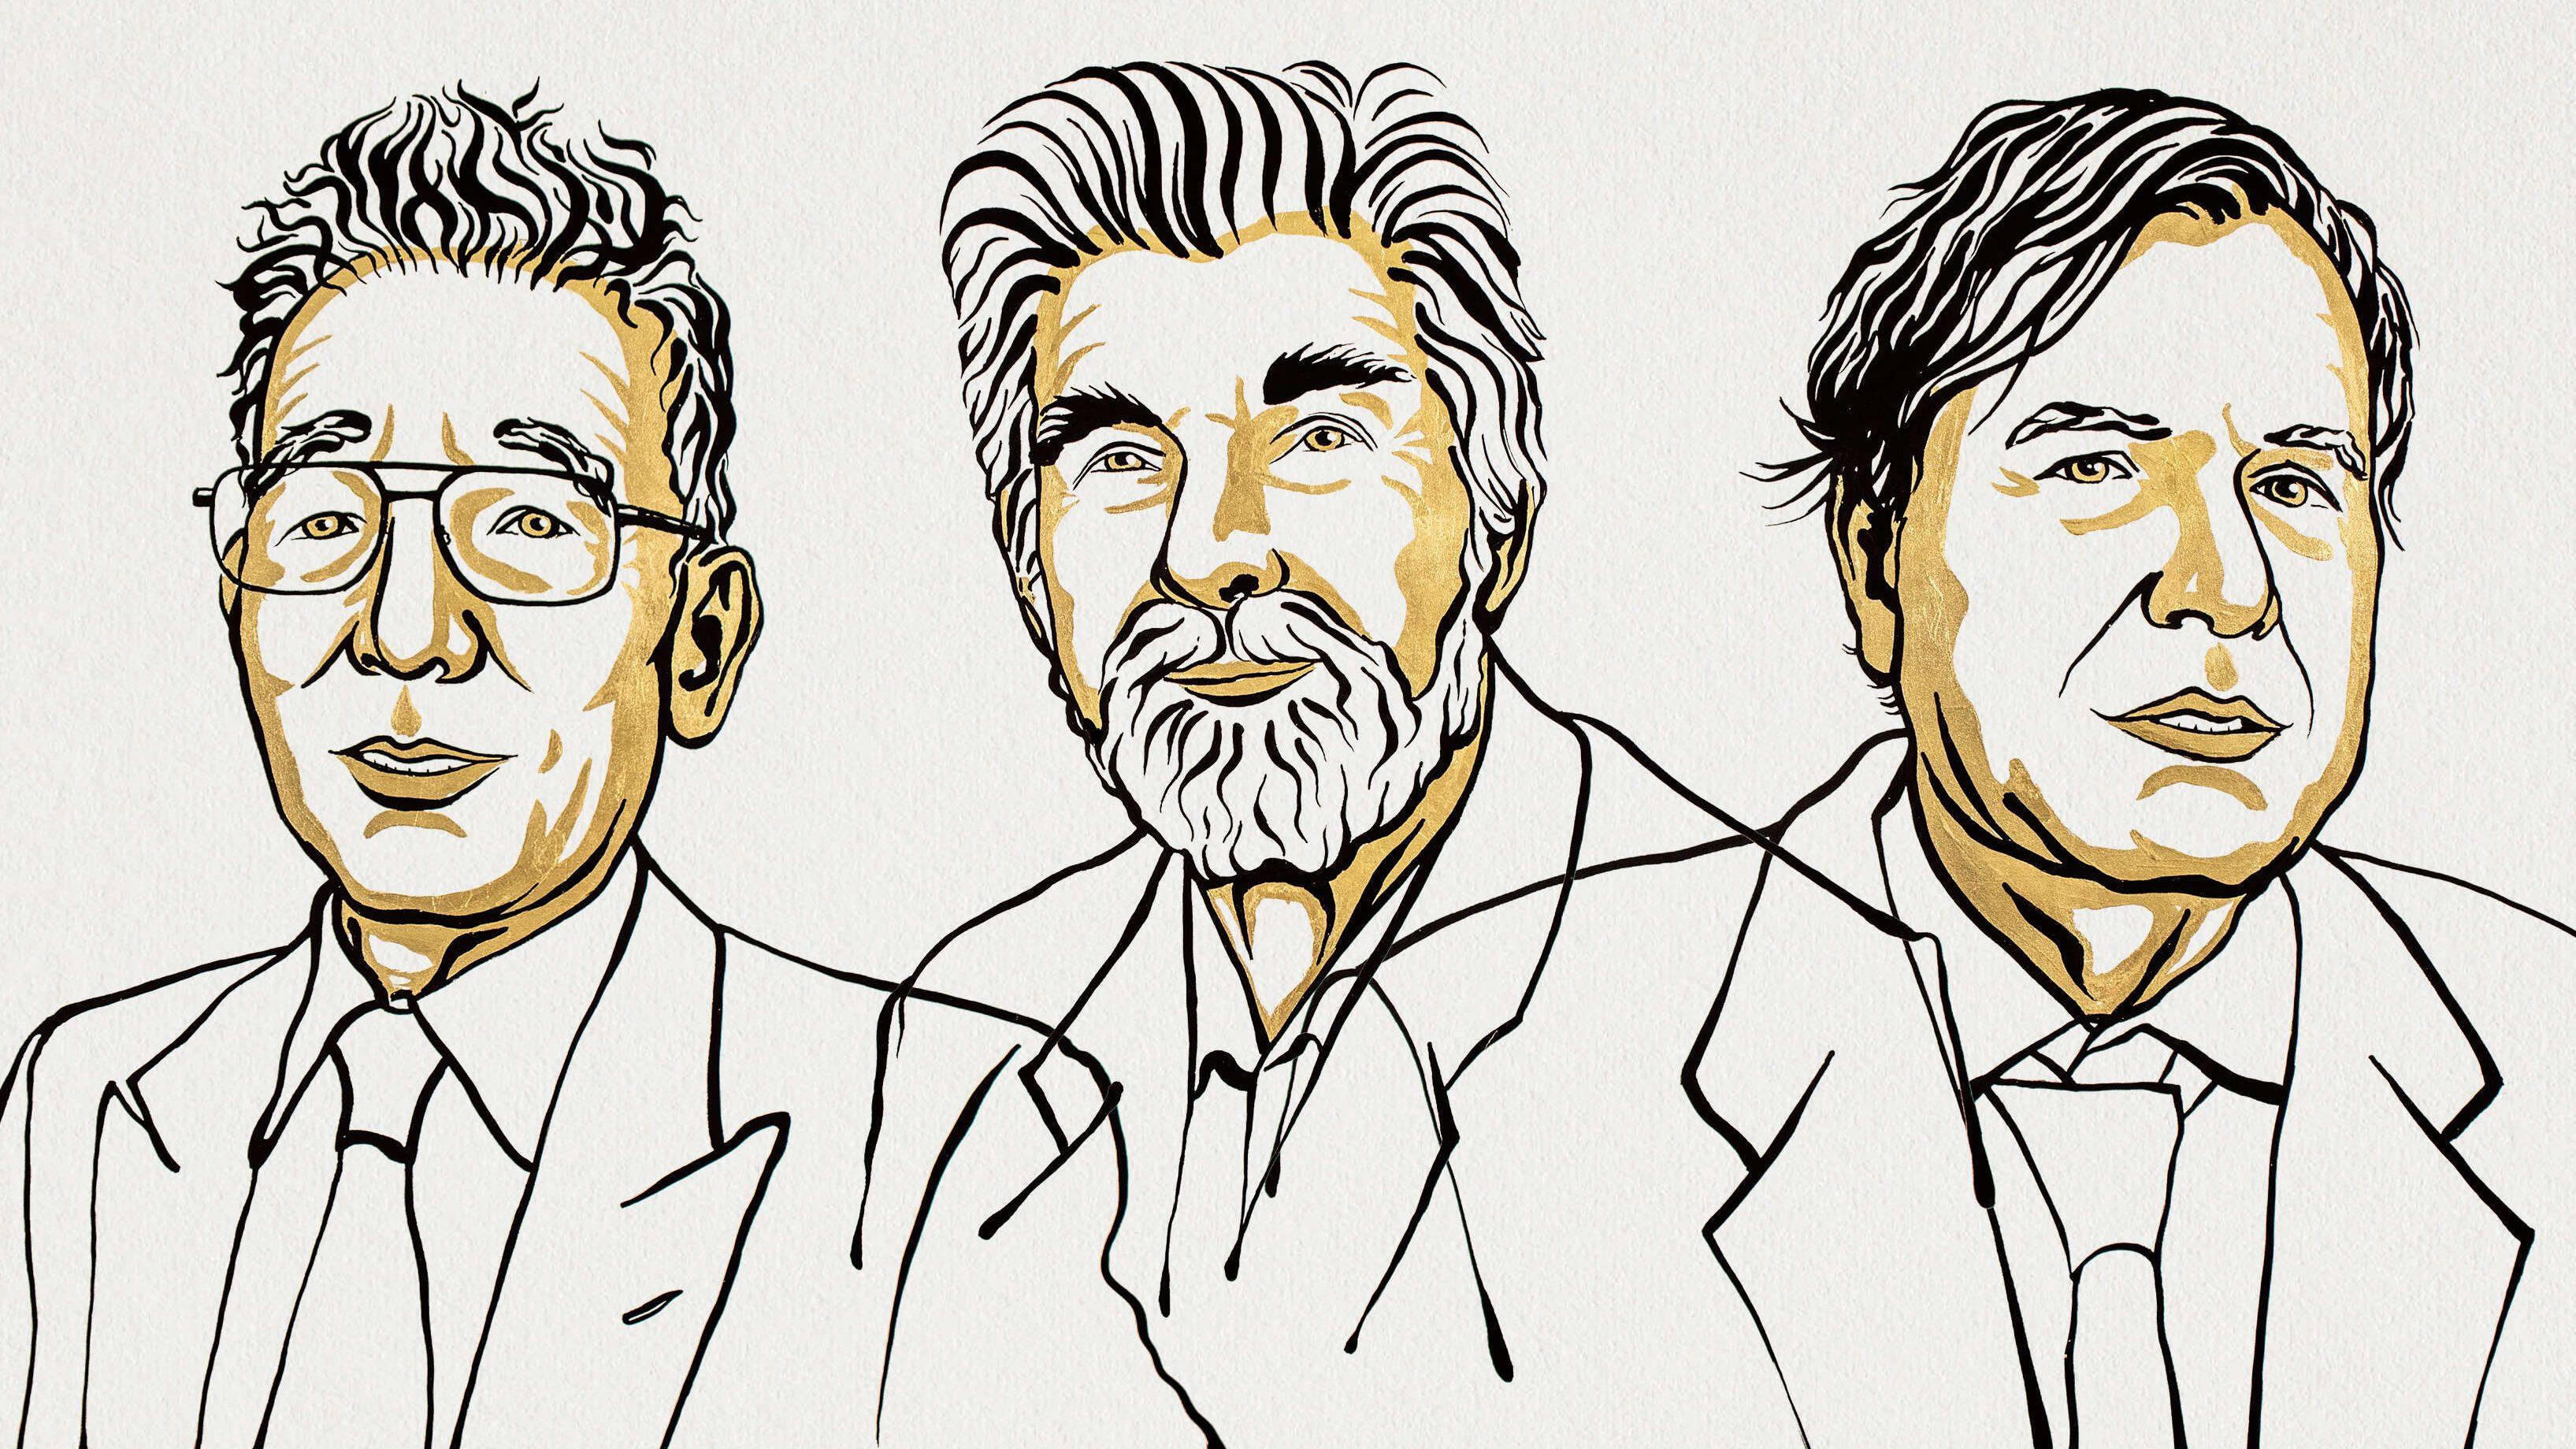 Syukuro Manabe, Klaus Hasselmann and Giorgio Parisi, winners of the 2021 Nobel Prize in Physics